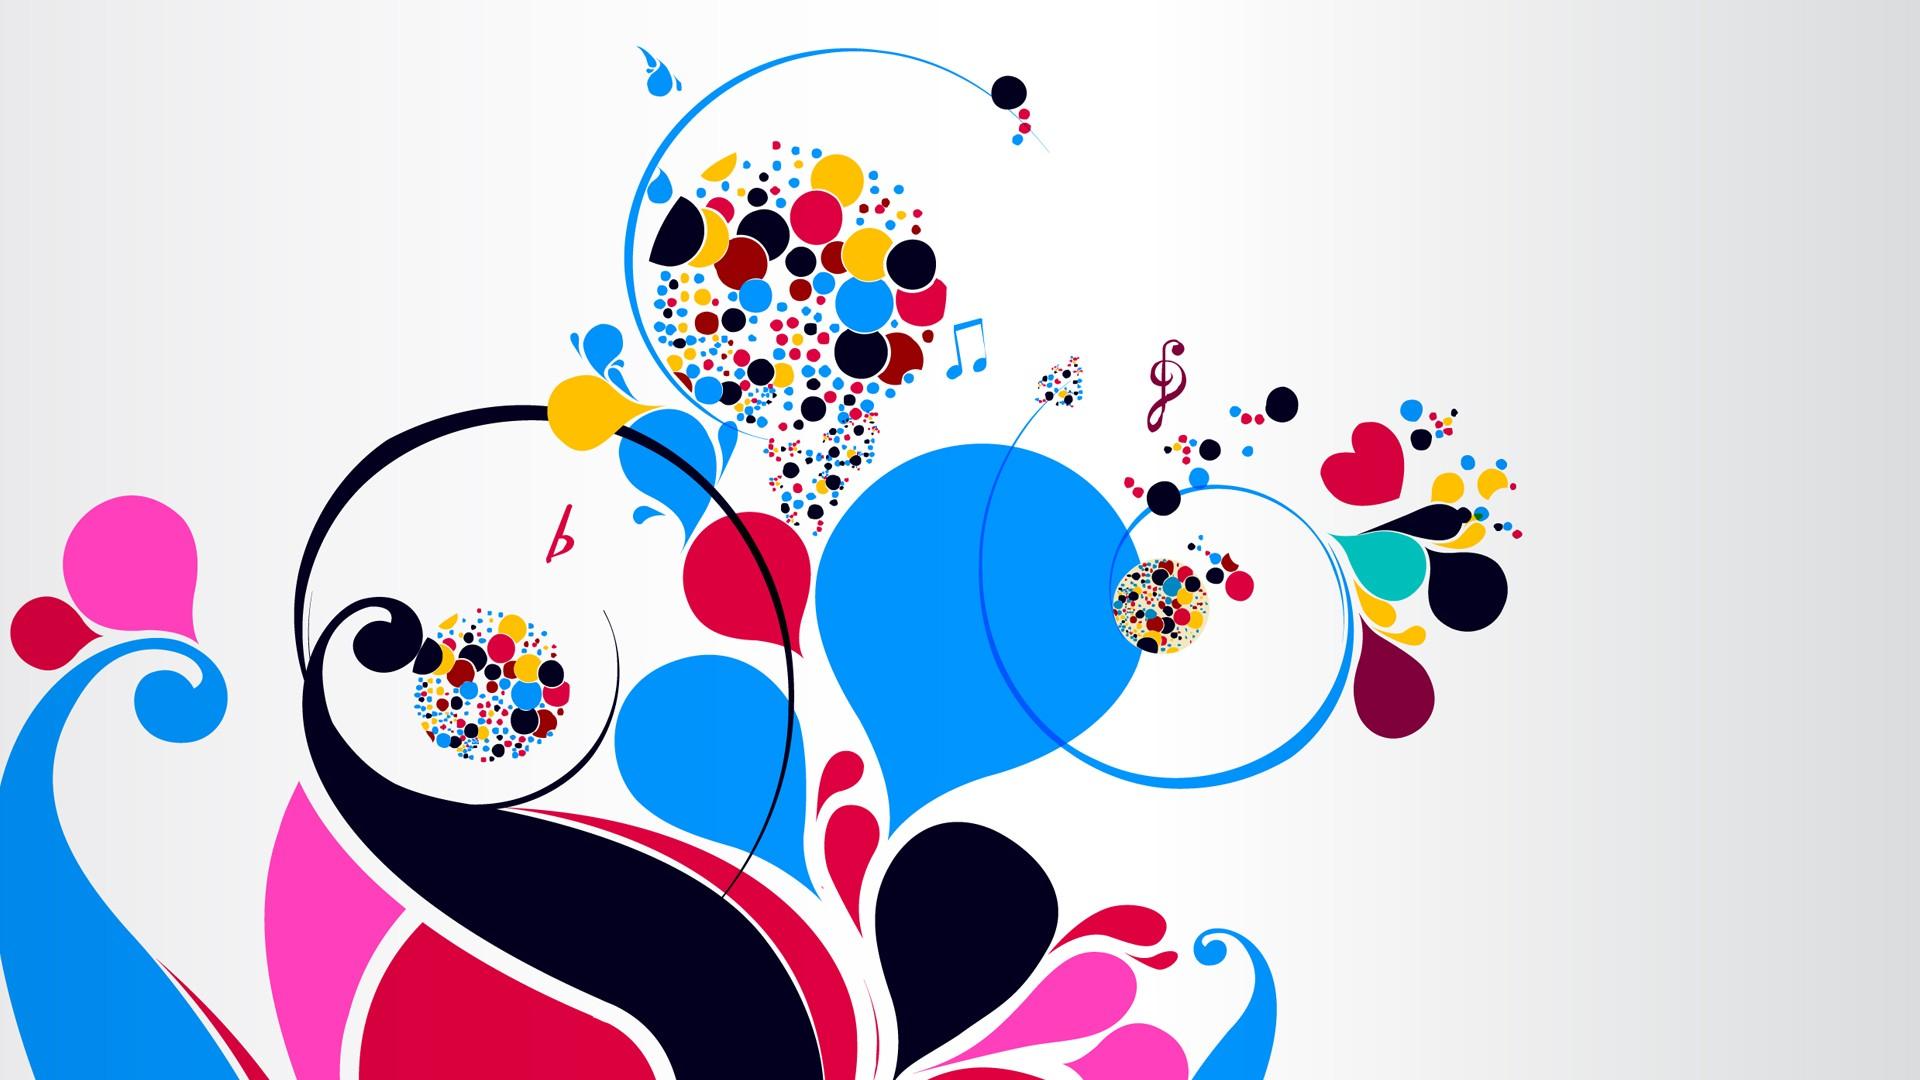 Popular Wallpaper Music Bright - colorful-illustration-cartoon-circle-bright-brand-notes-treble-clef-ART-patterns-font-organ-586780  Gallery_483479.jpg